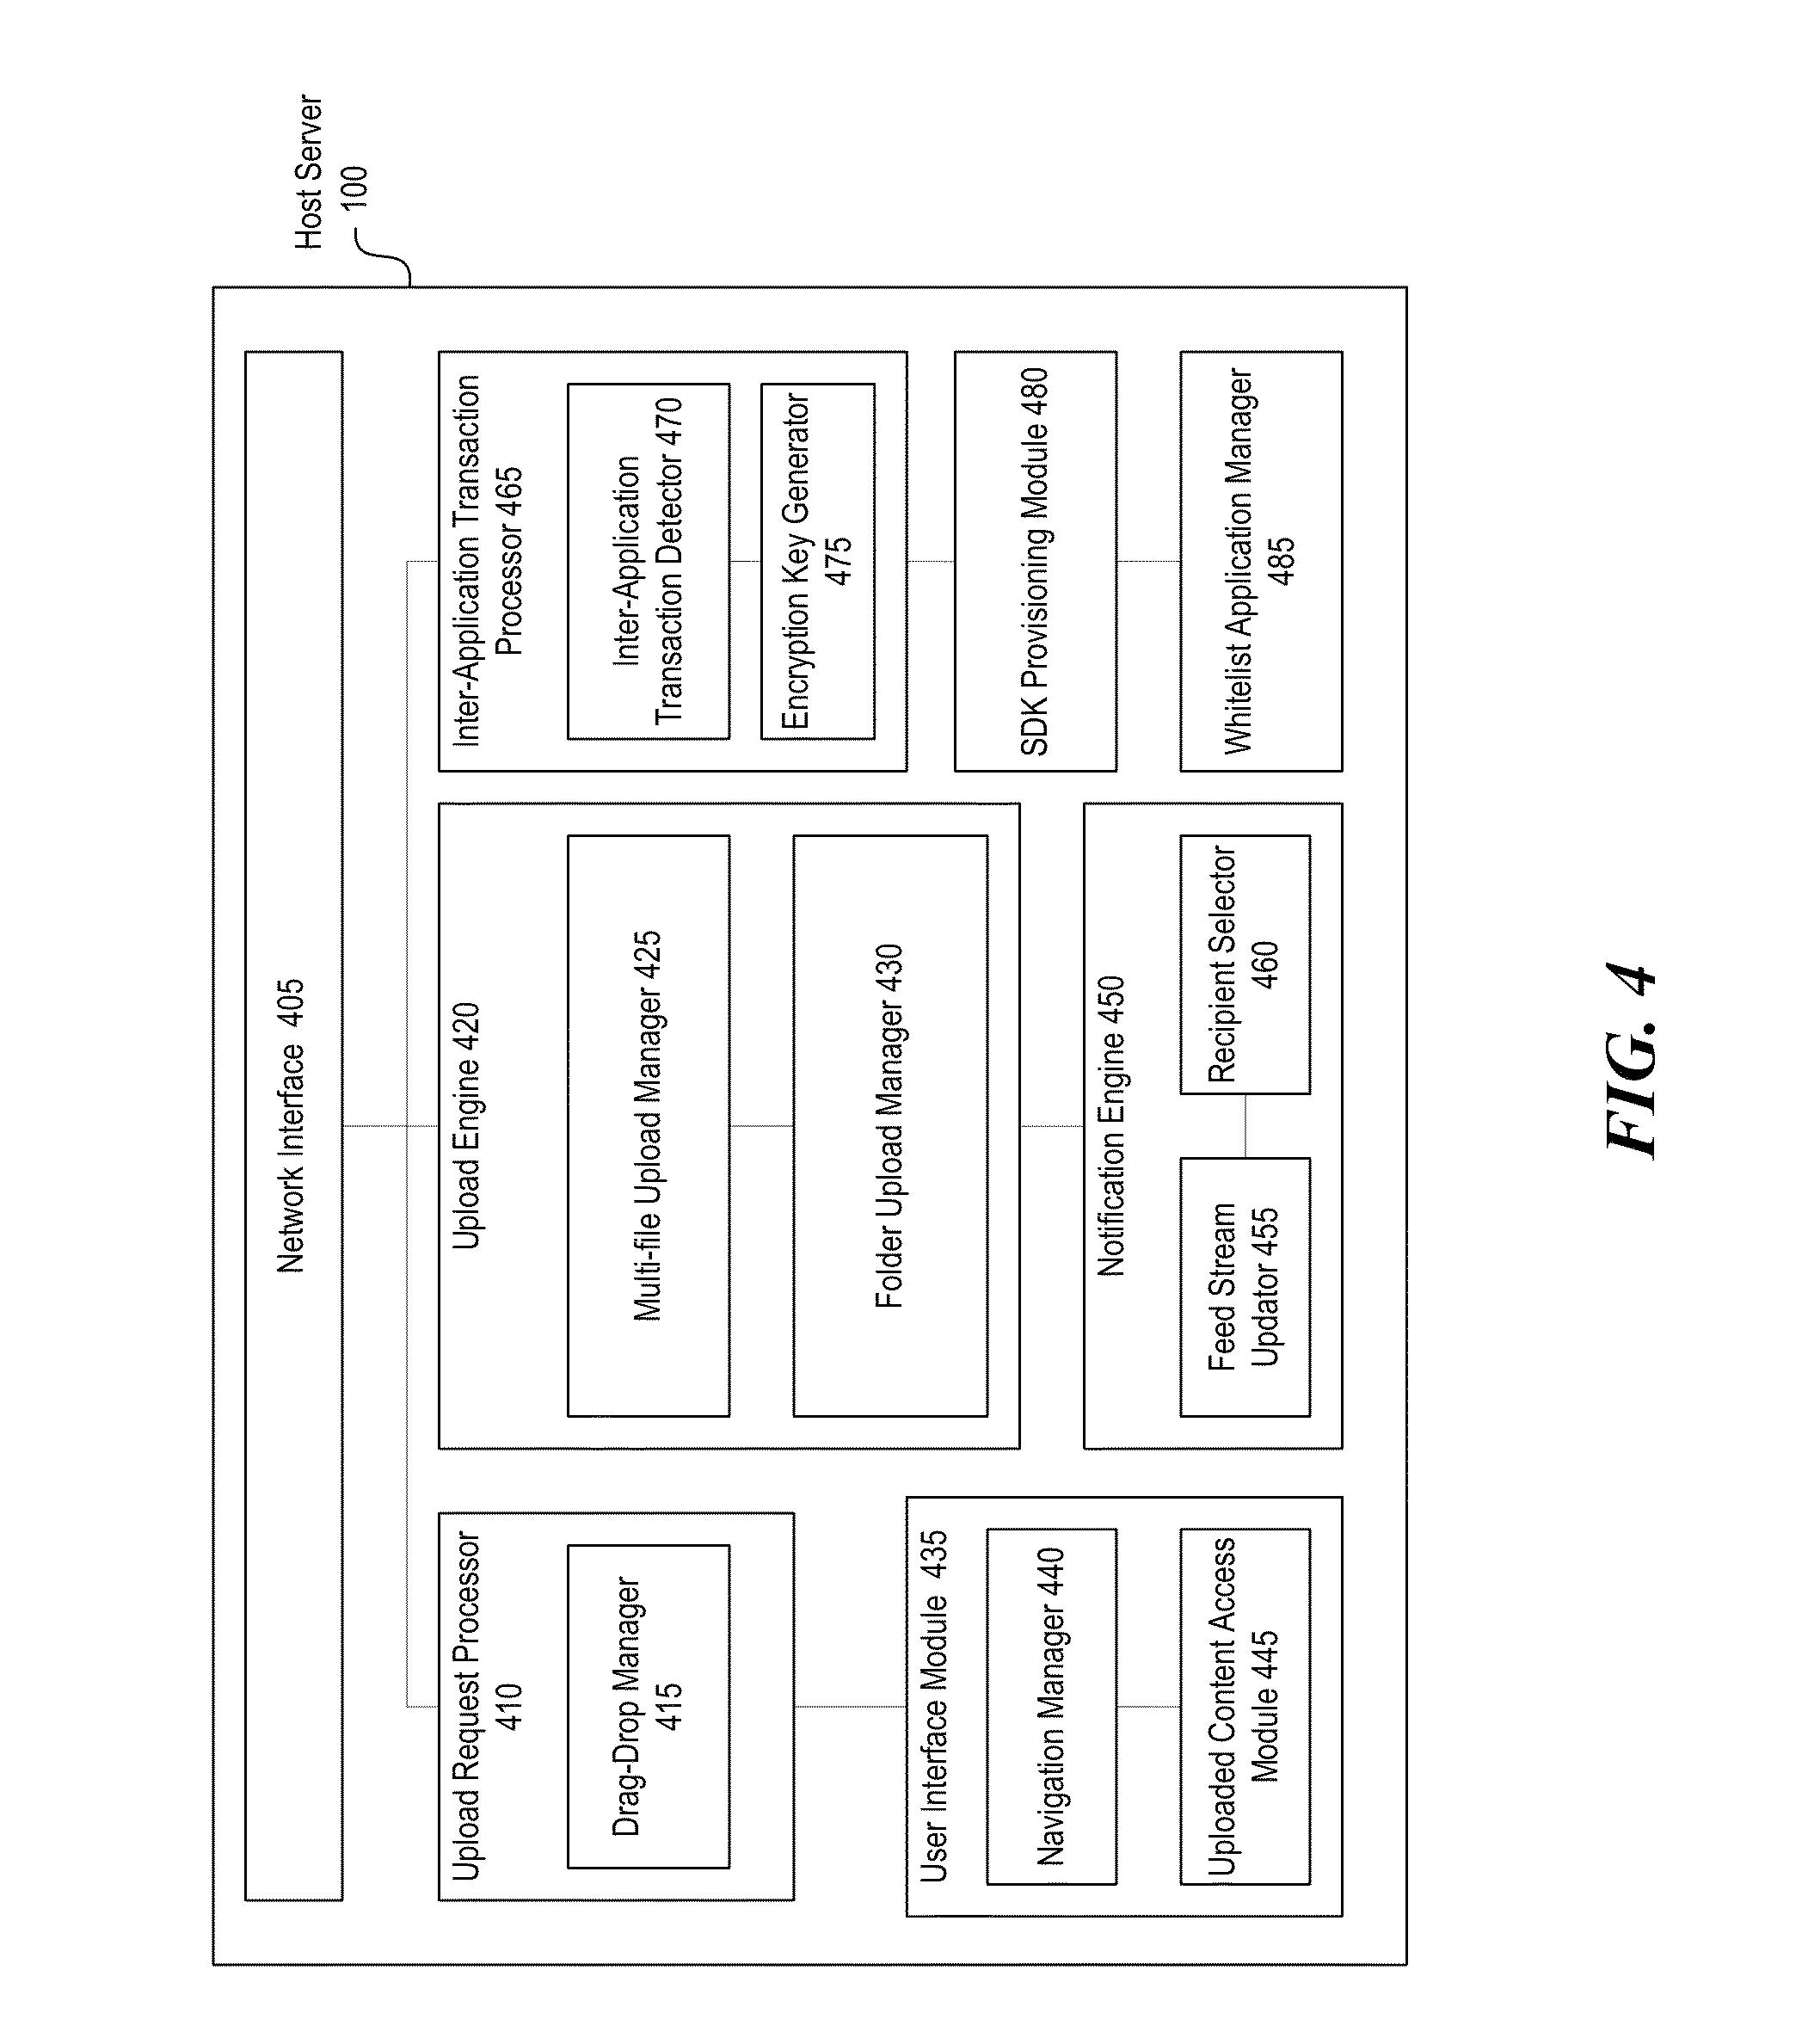 Patent US 9,450,926 B2